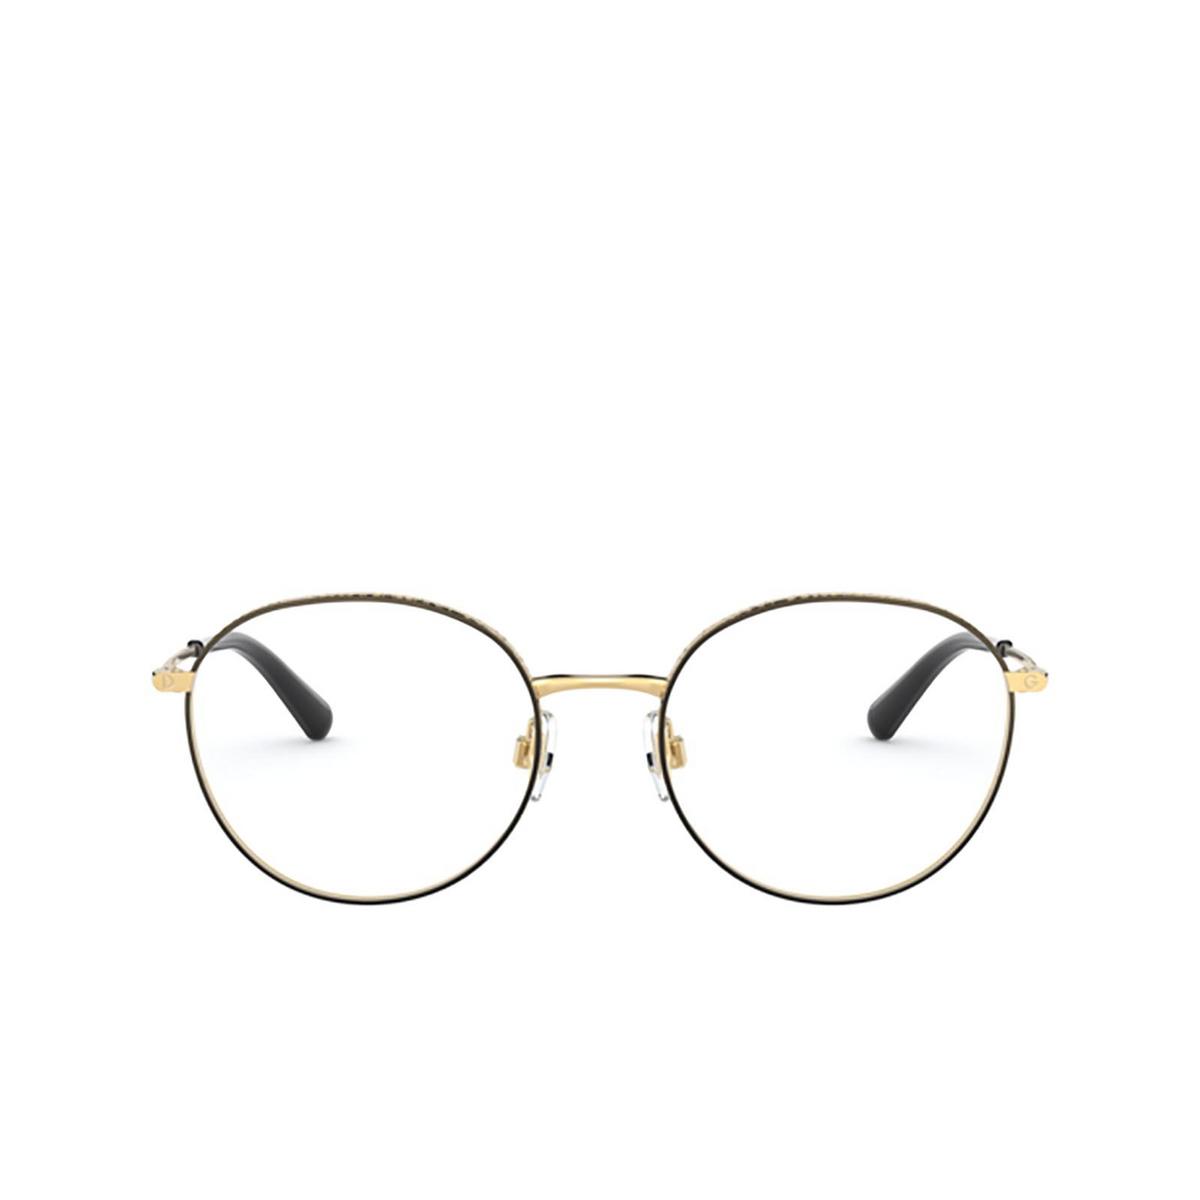 Dolce & Gabbana® Round Eyeglasses: DG1322 color Gold / Black 1334 - front view.